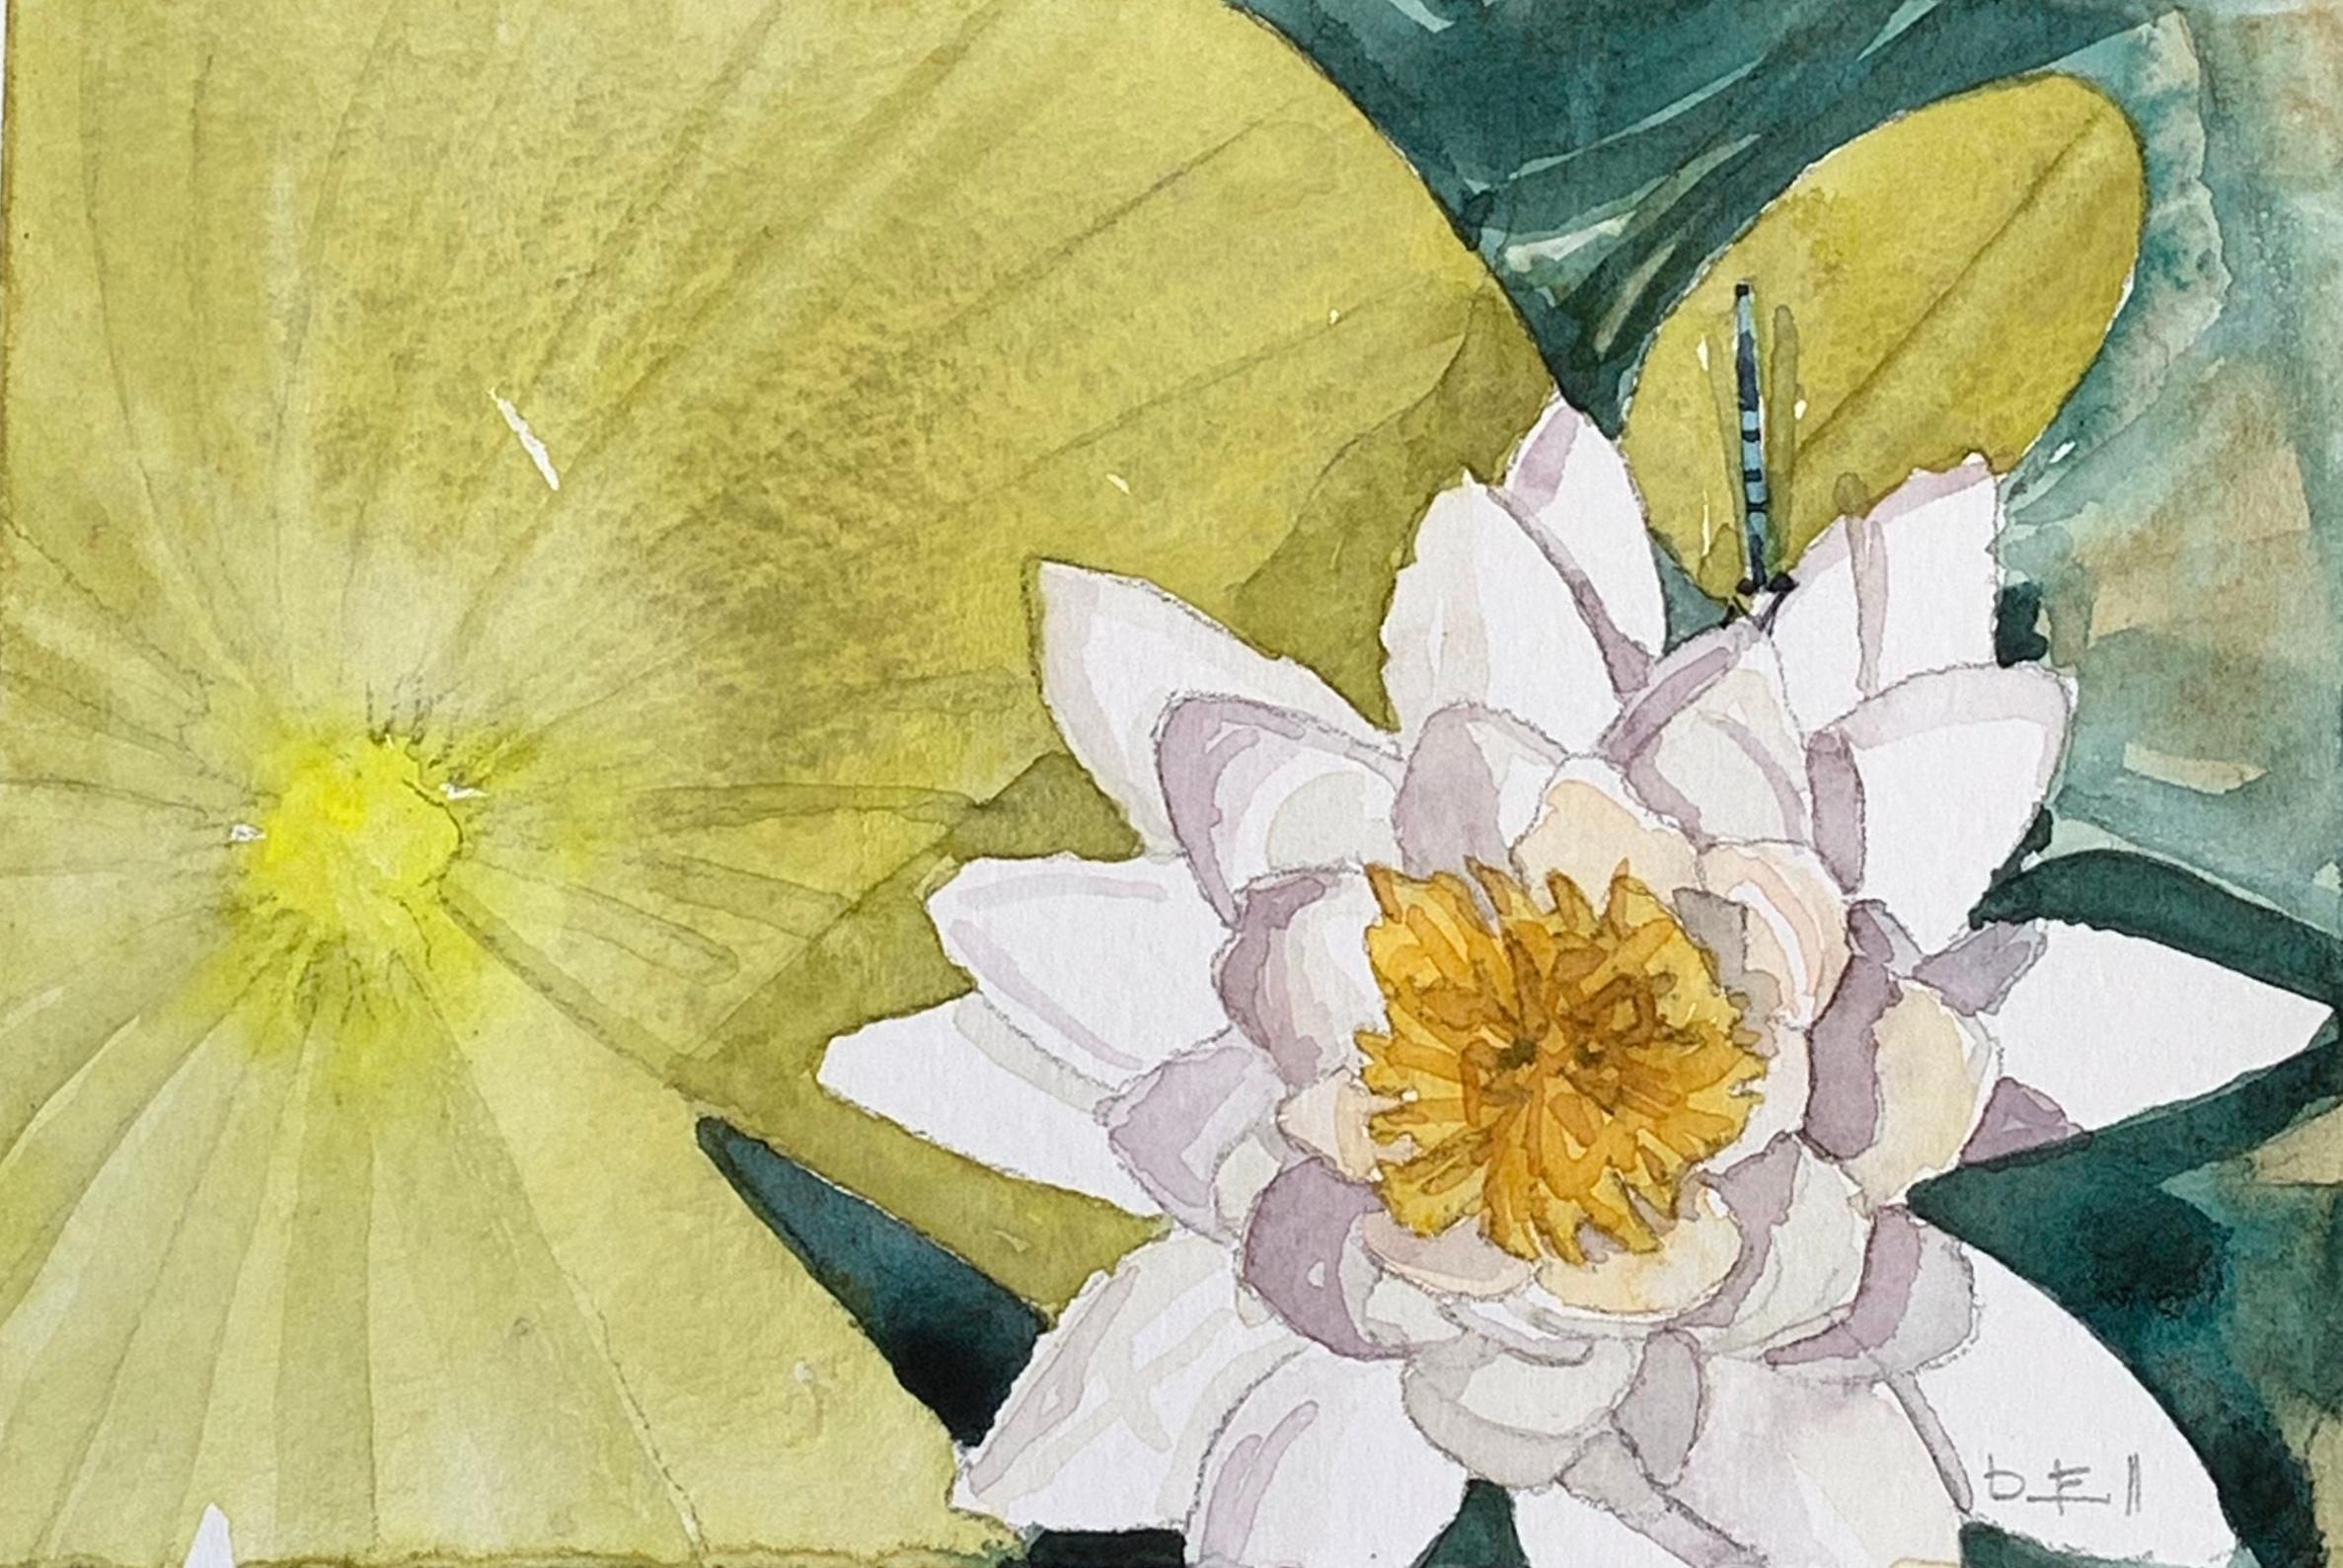 040 michigan water lily sn4lrg